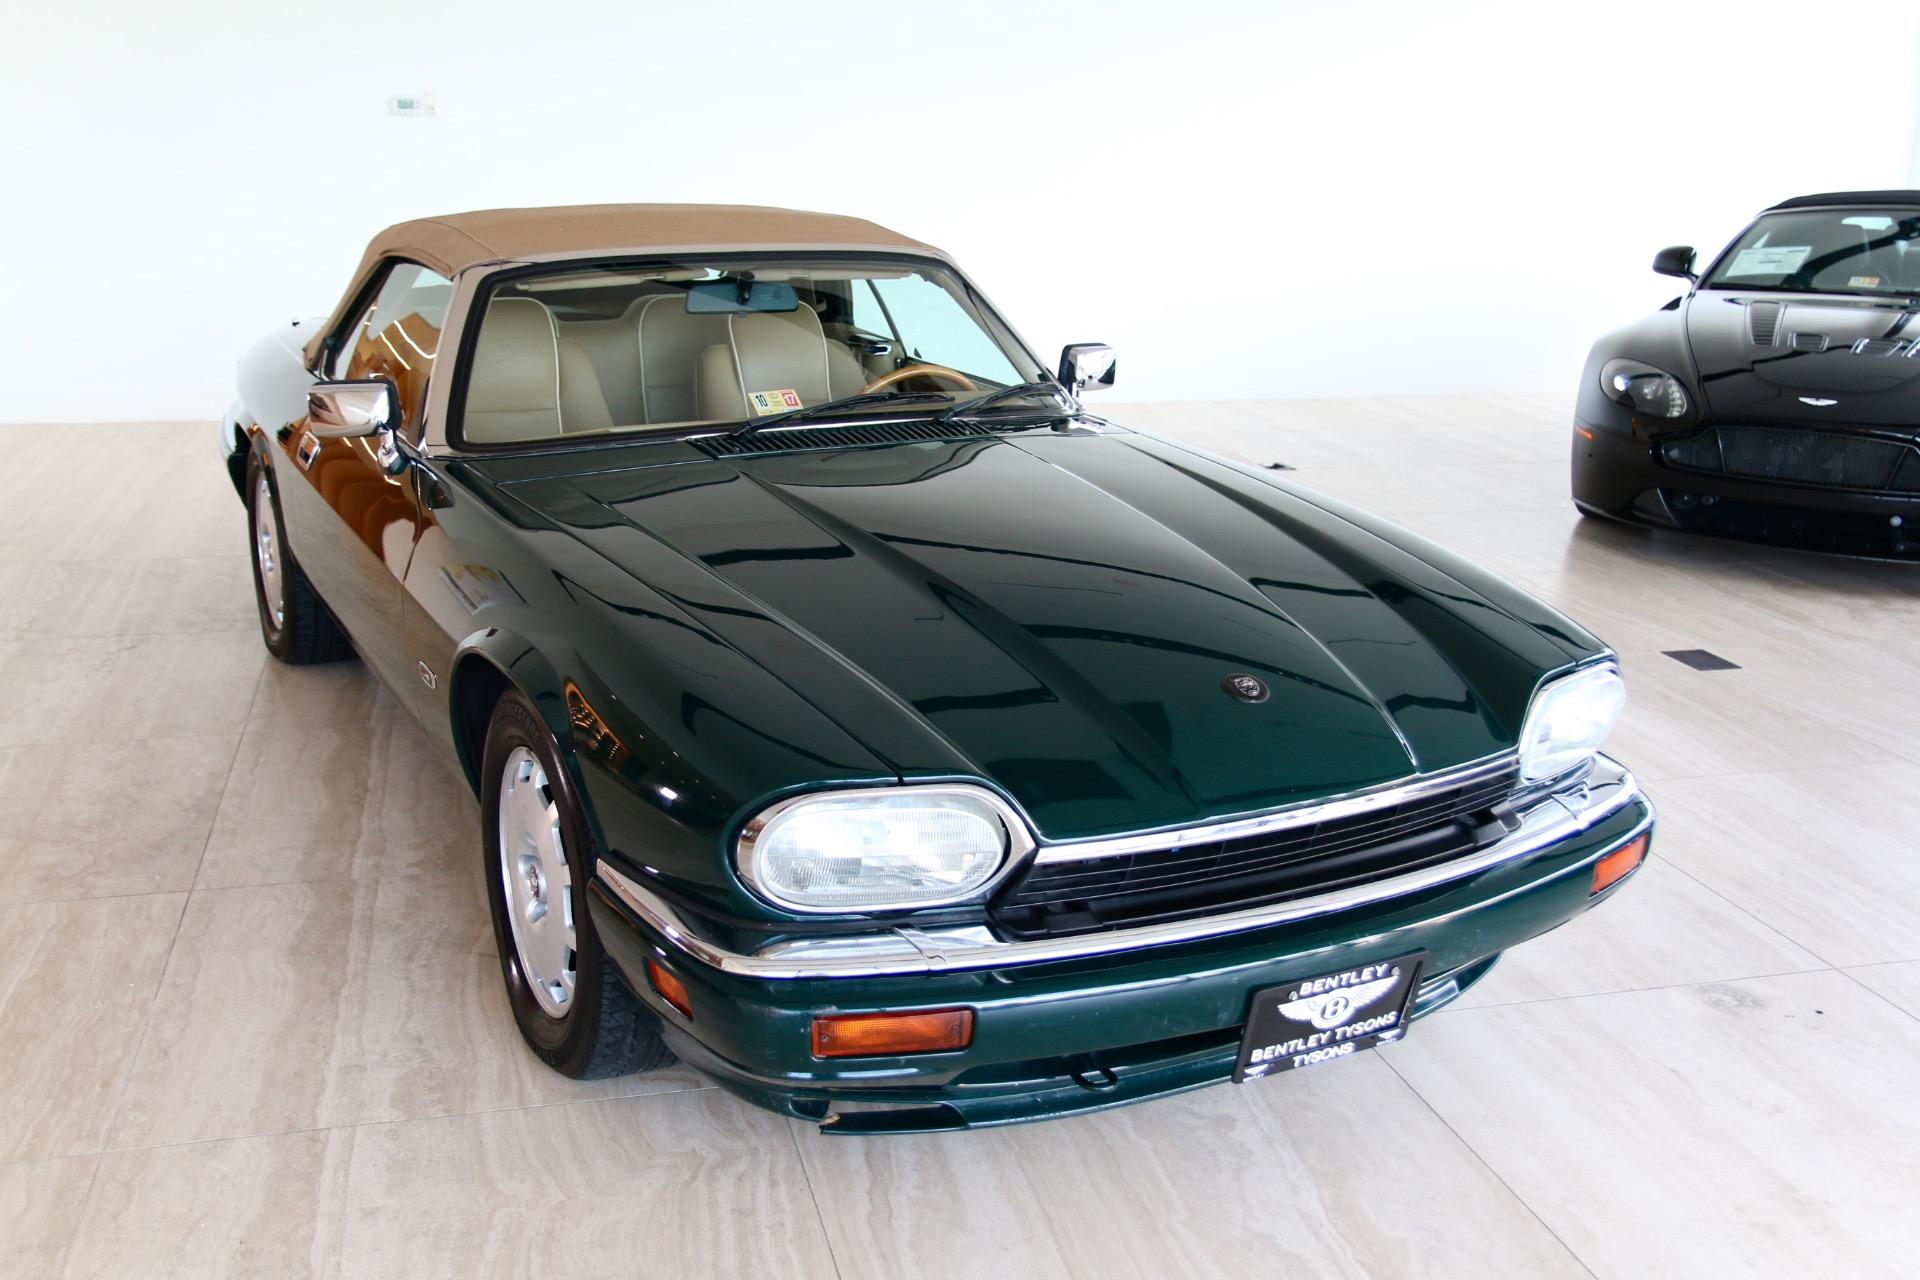 1996 jaguar xj series xjs stock p225246 for sale near vienna va va jaguar dealer for sale. Black Bedroom Furniture Sets. Home Design Ideas